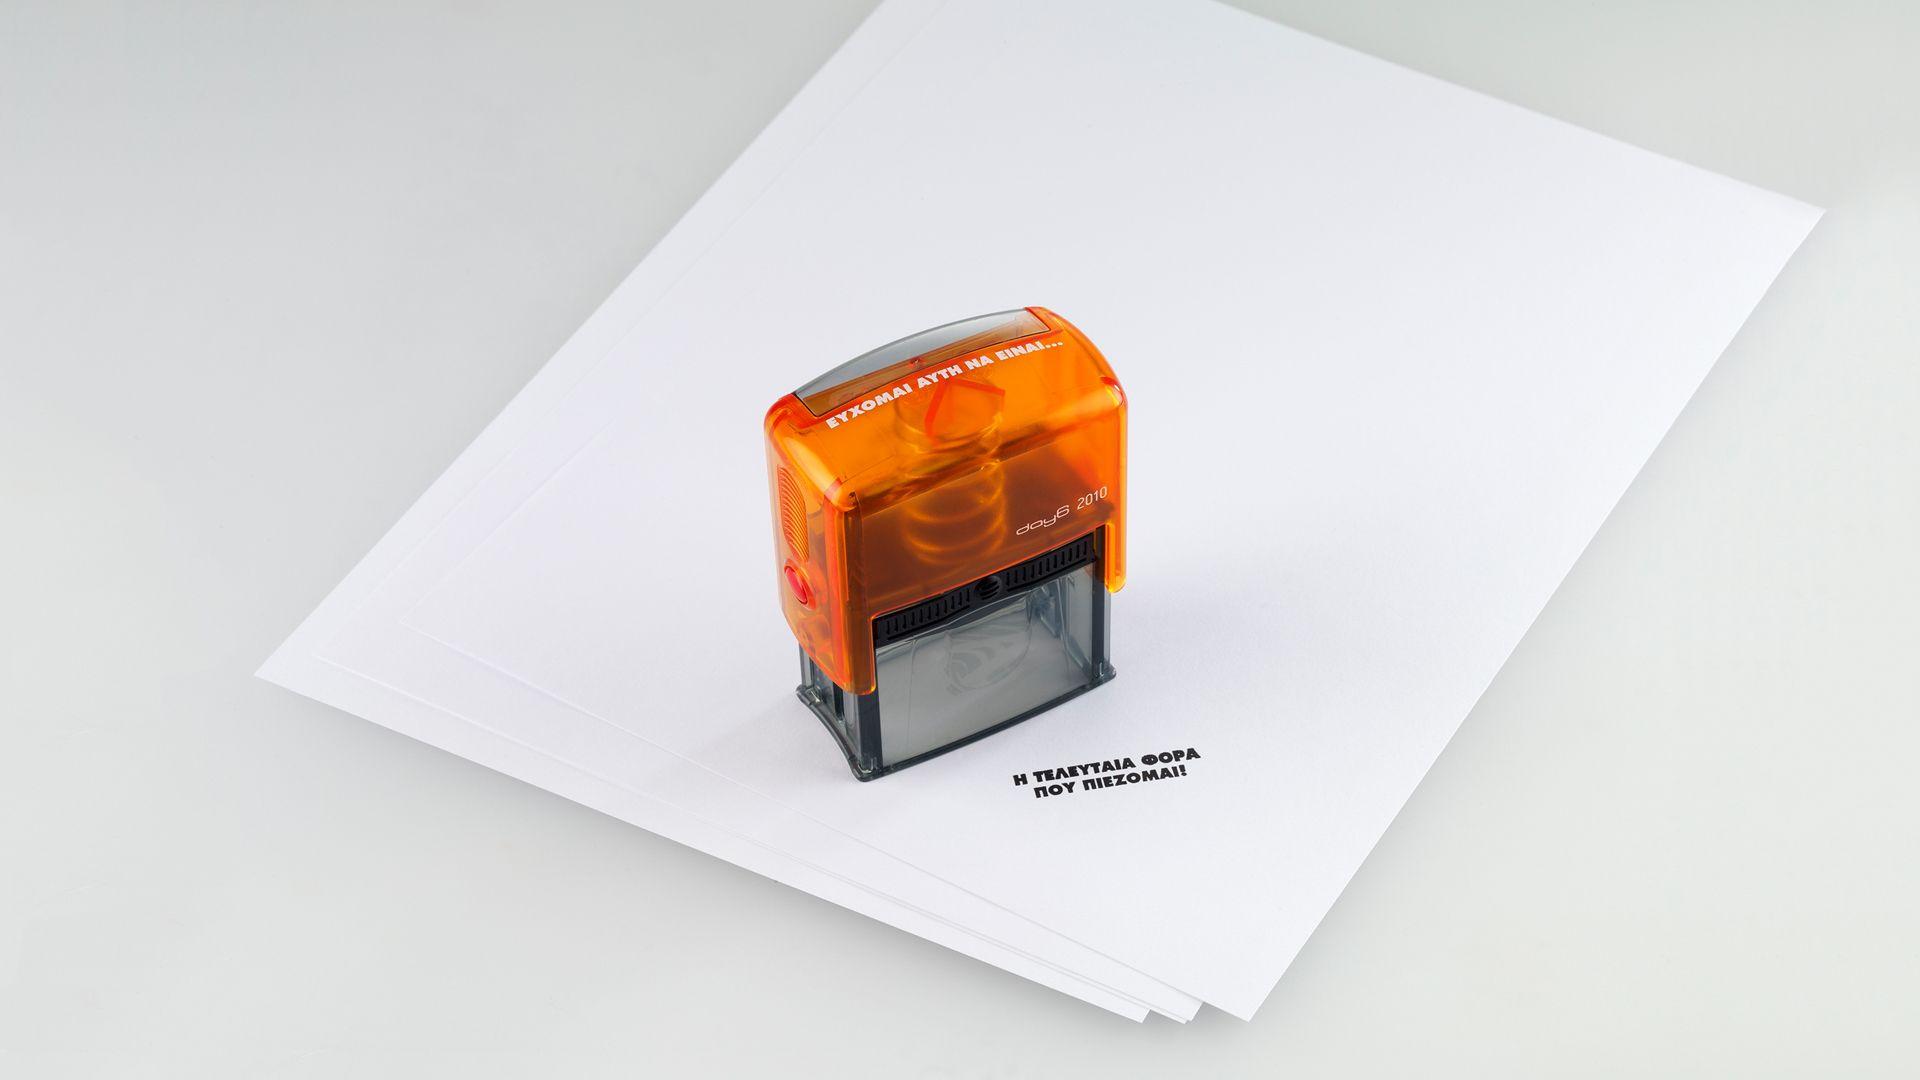 02-direct_stamp.jpg